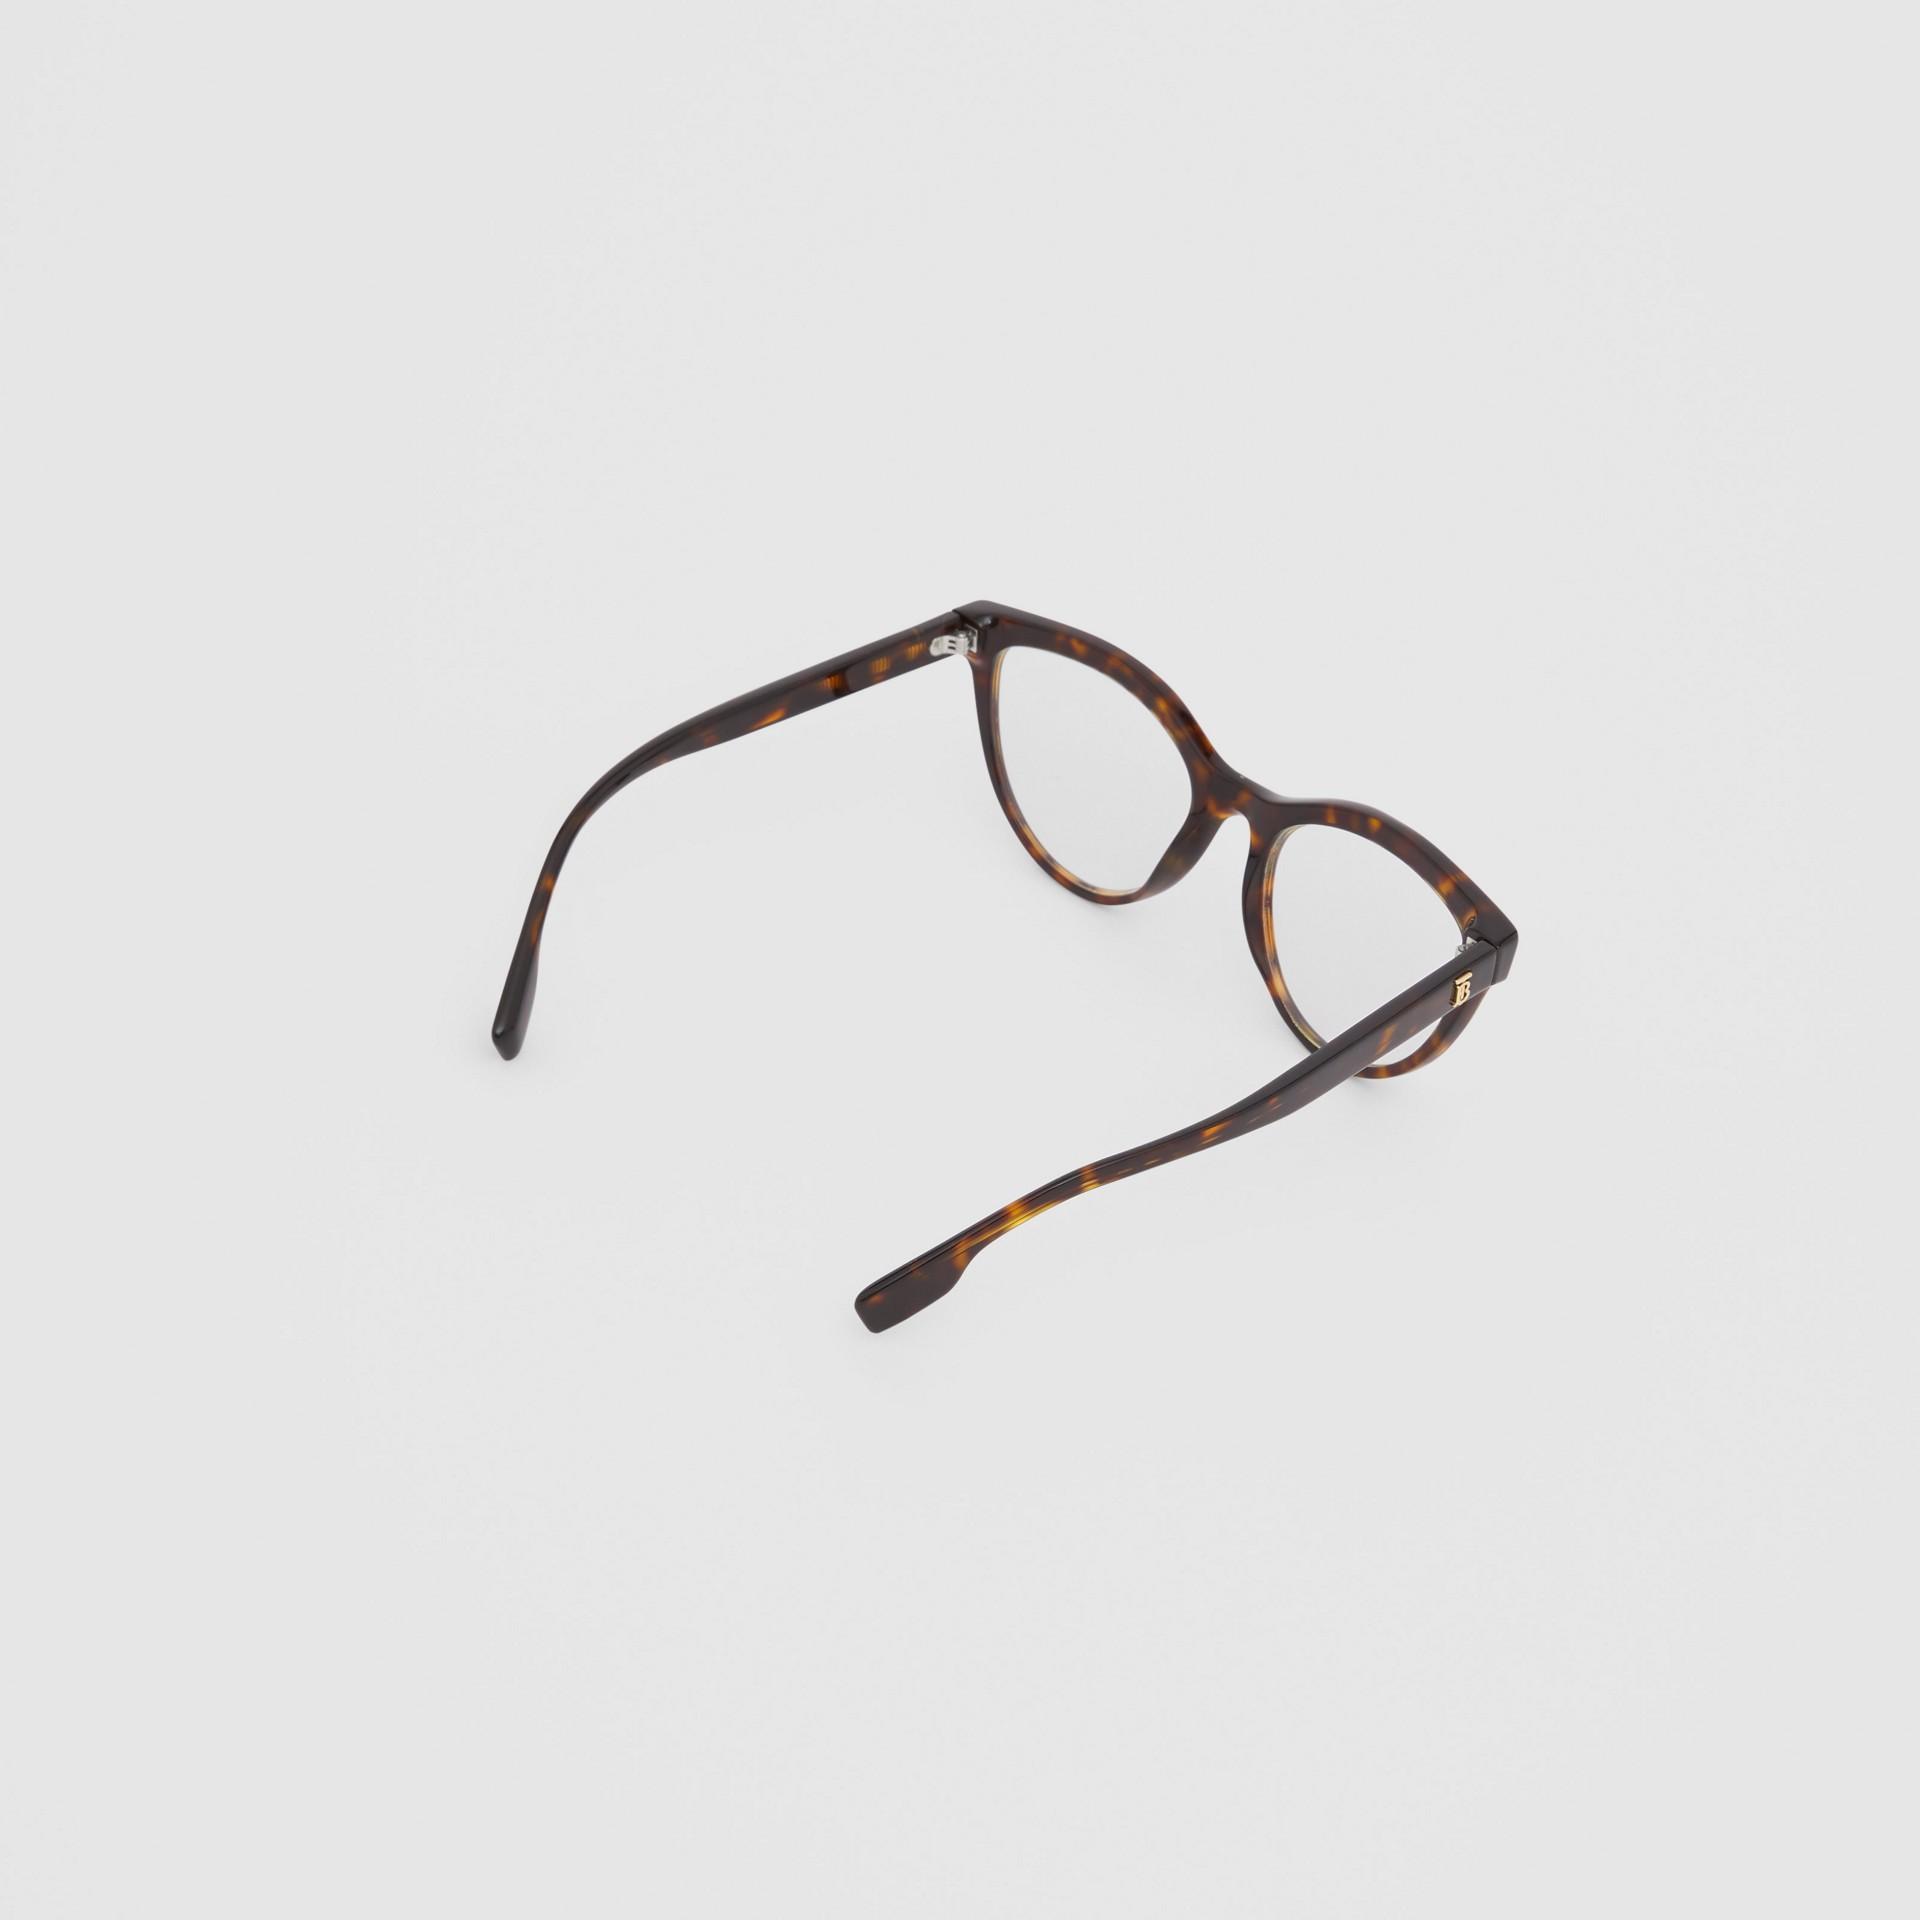 Monogram Motif Cat-eye Optical Frames in Tortoiseshell - Women | Burberry Hong Kong S.A.R - gallery image 3